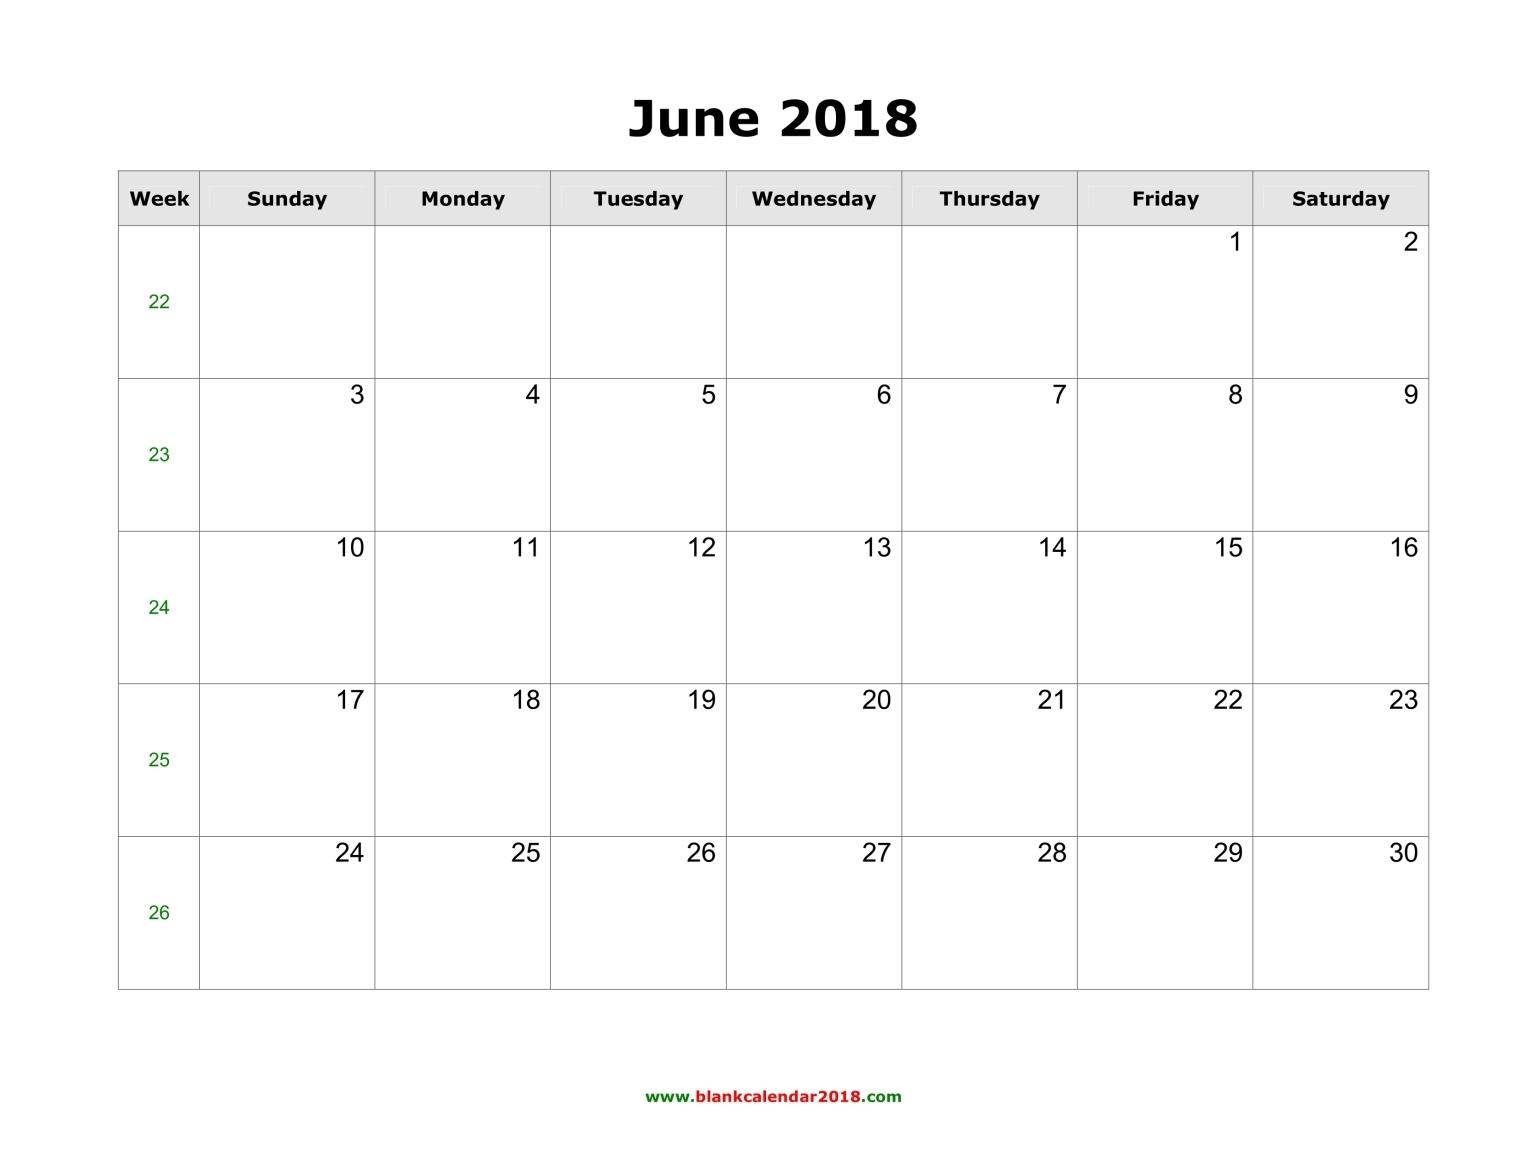 June 2018 Calendar Landscape